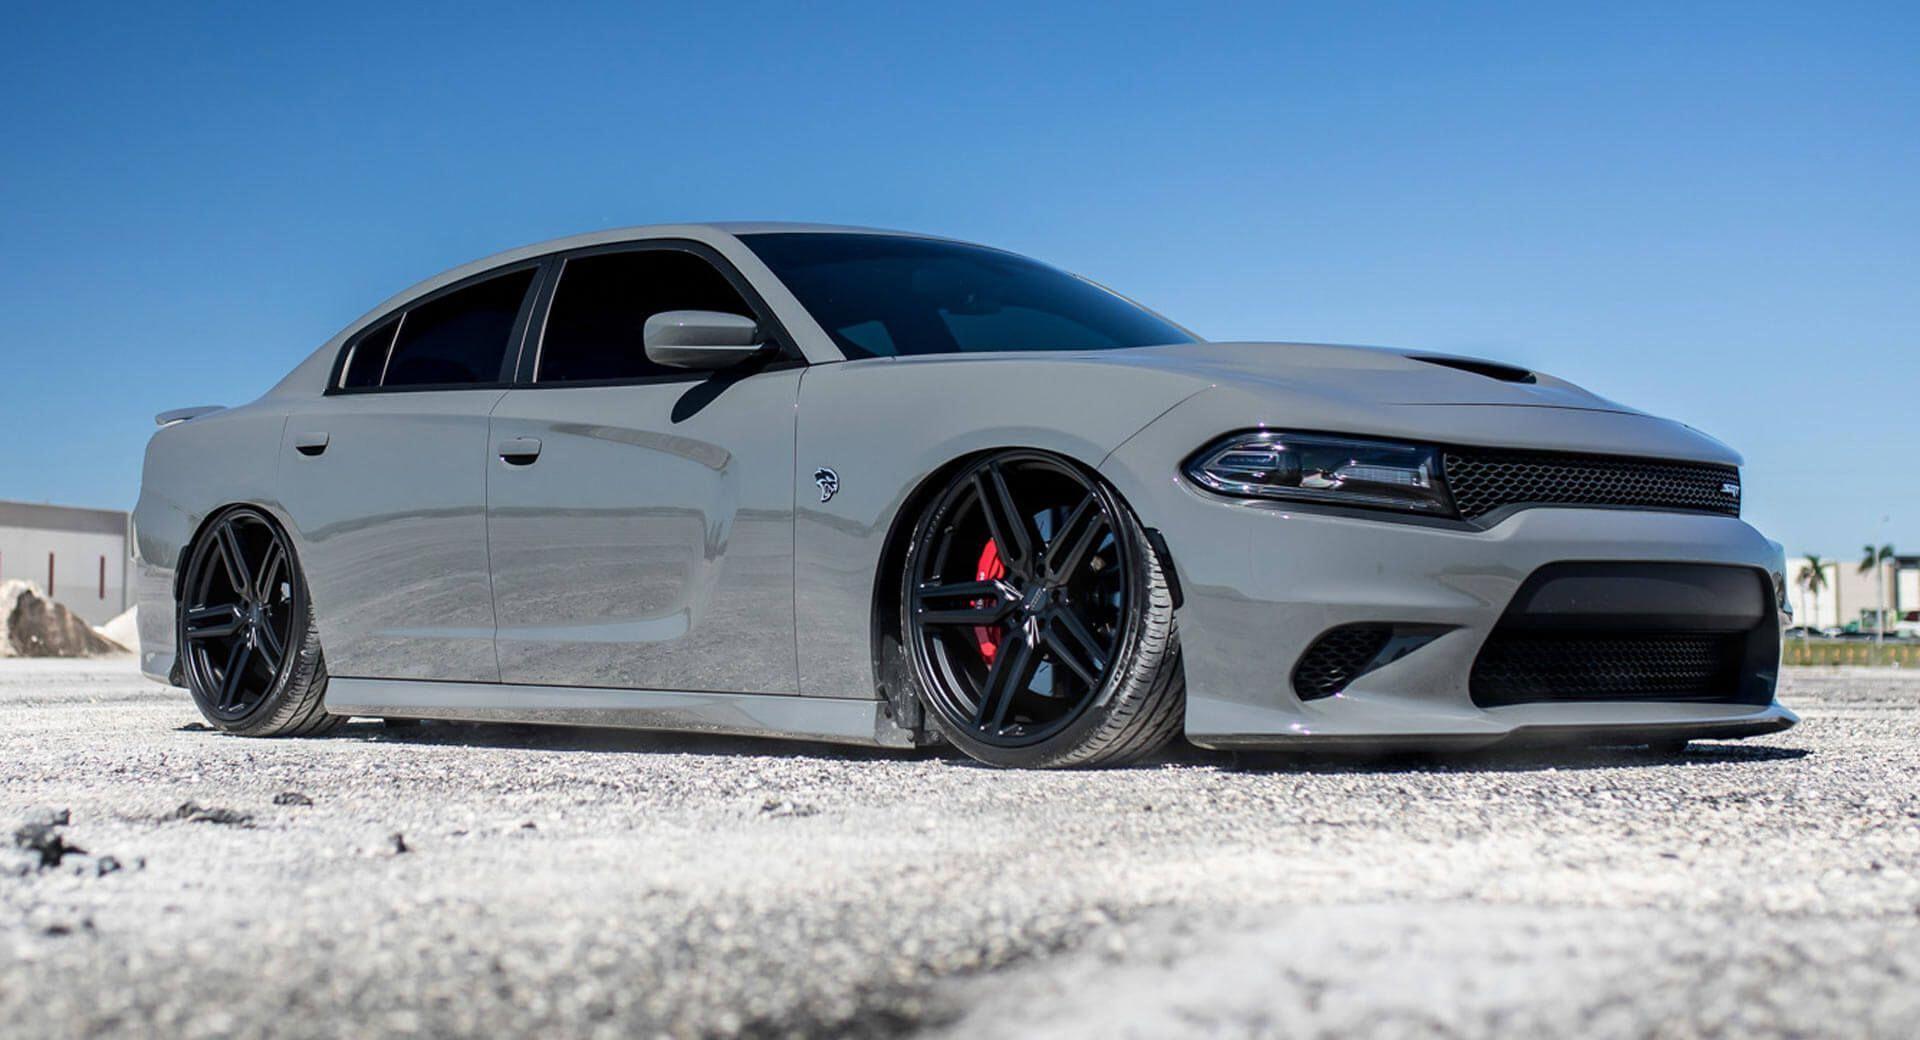 Dodge Charger Srt Hellcat Gets Ultra Low Suspension New Wheels Carscoops Dodge Charger Srt Charger Srt Hellcat Charger Srt